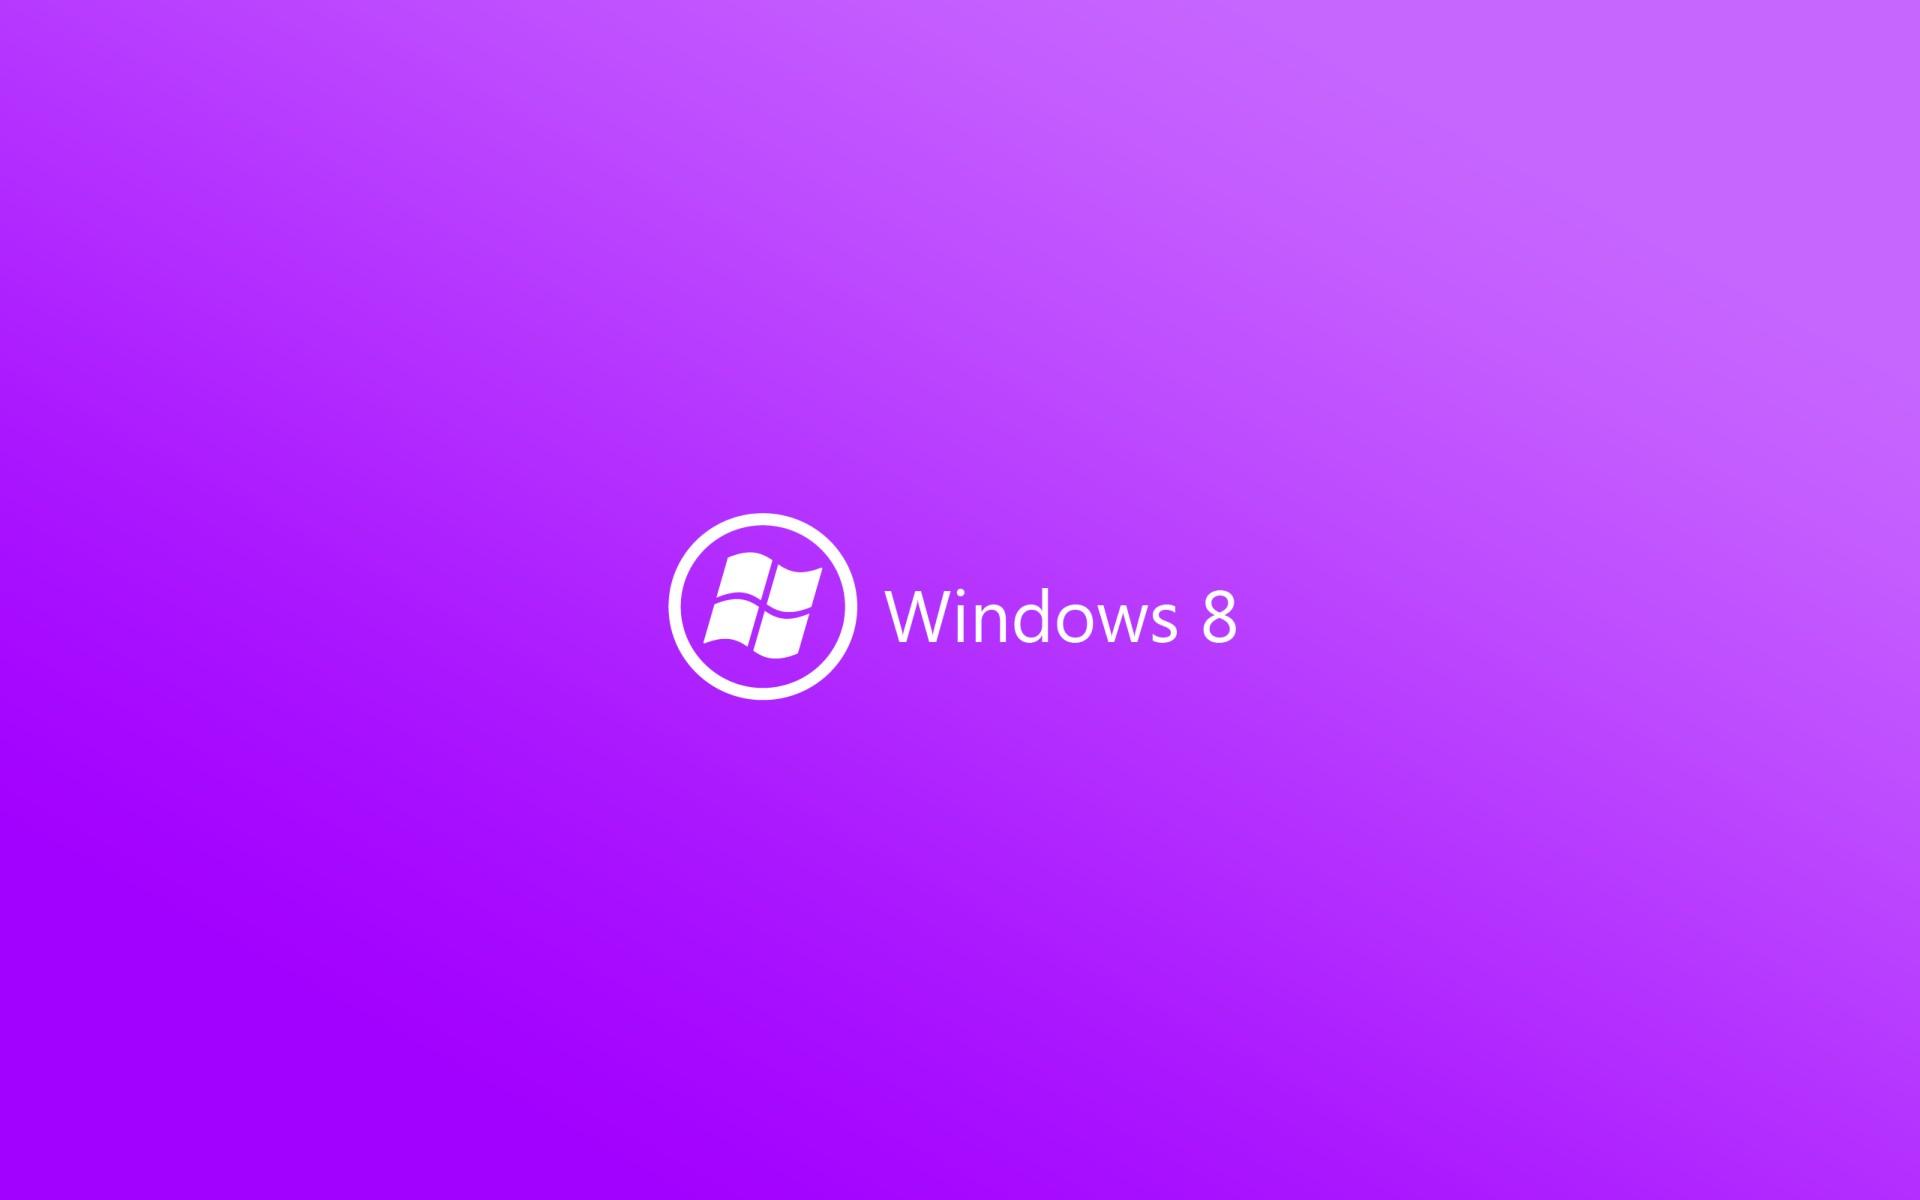 Windows 8 Official Wallpaper Purple Windows 8 Wallpaper: L...